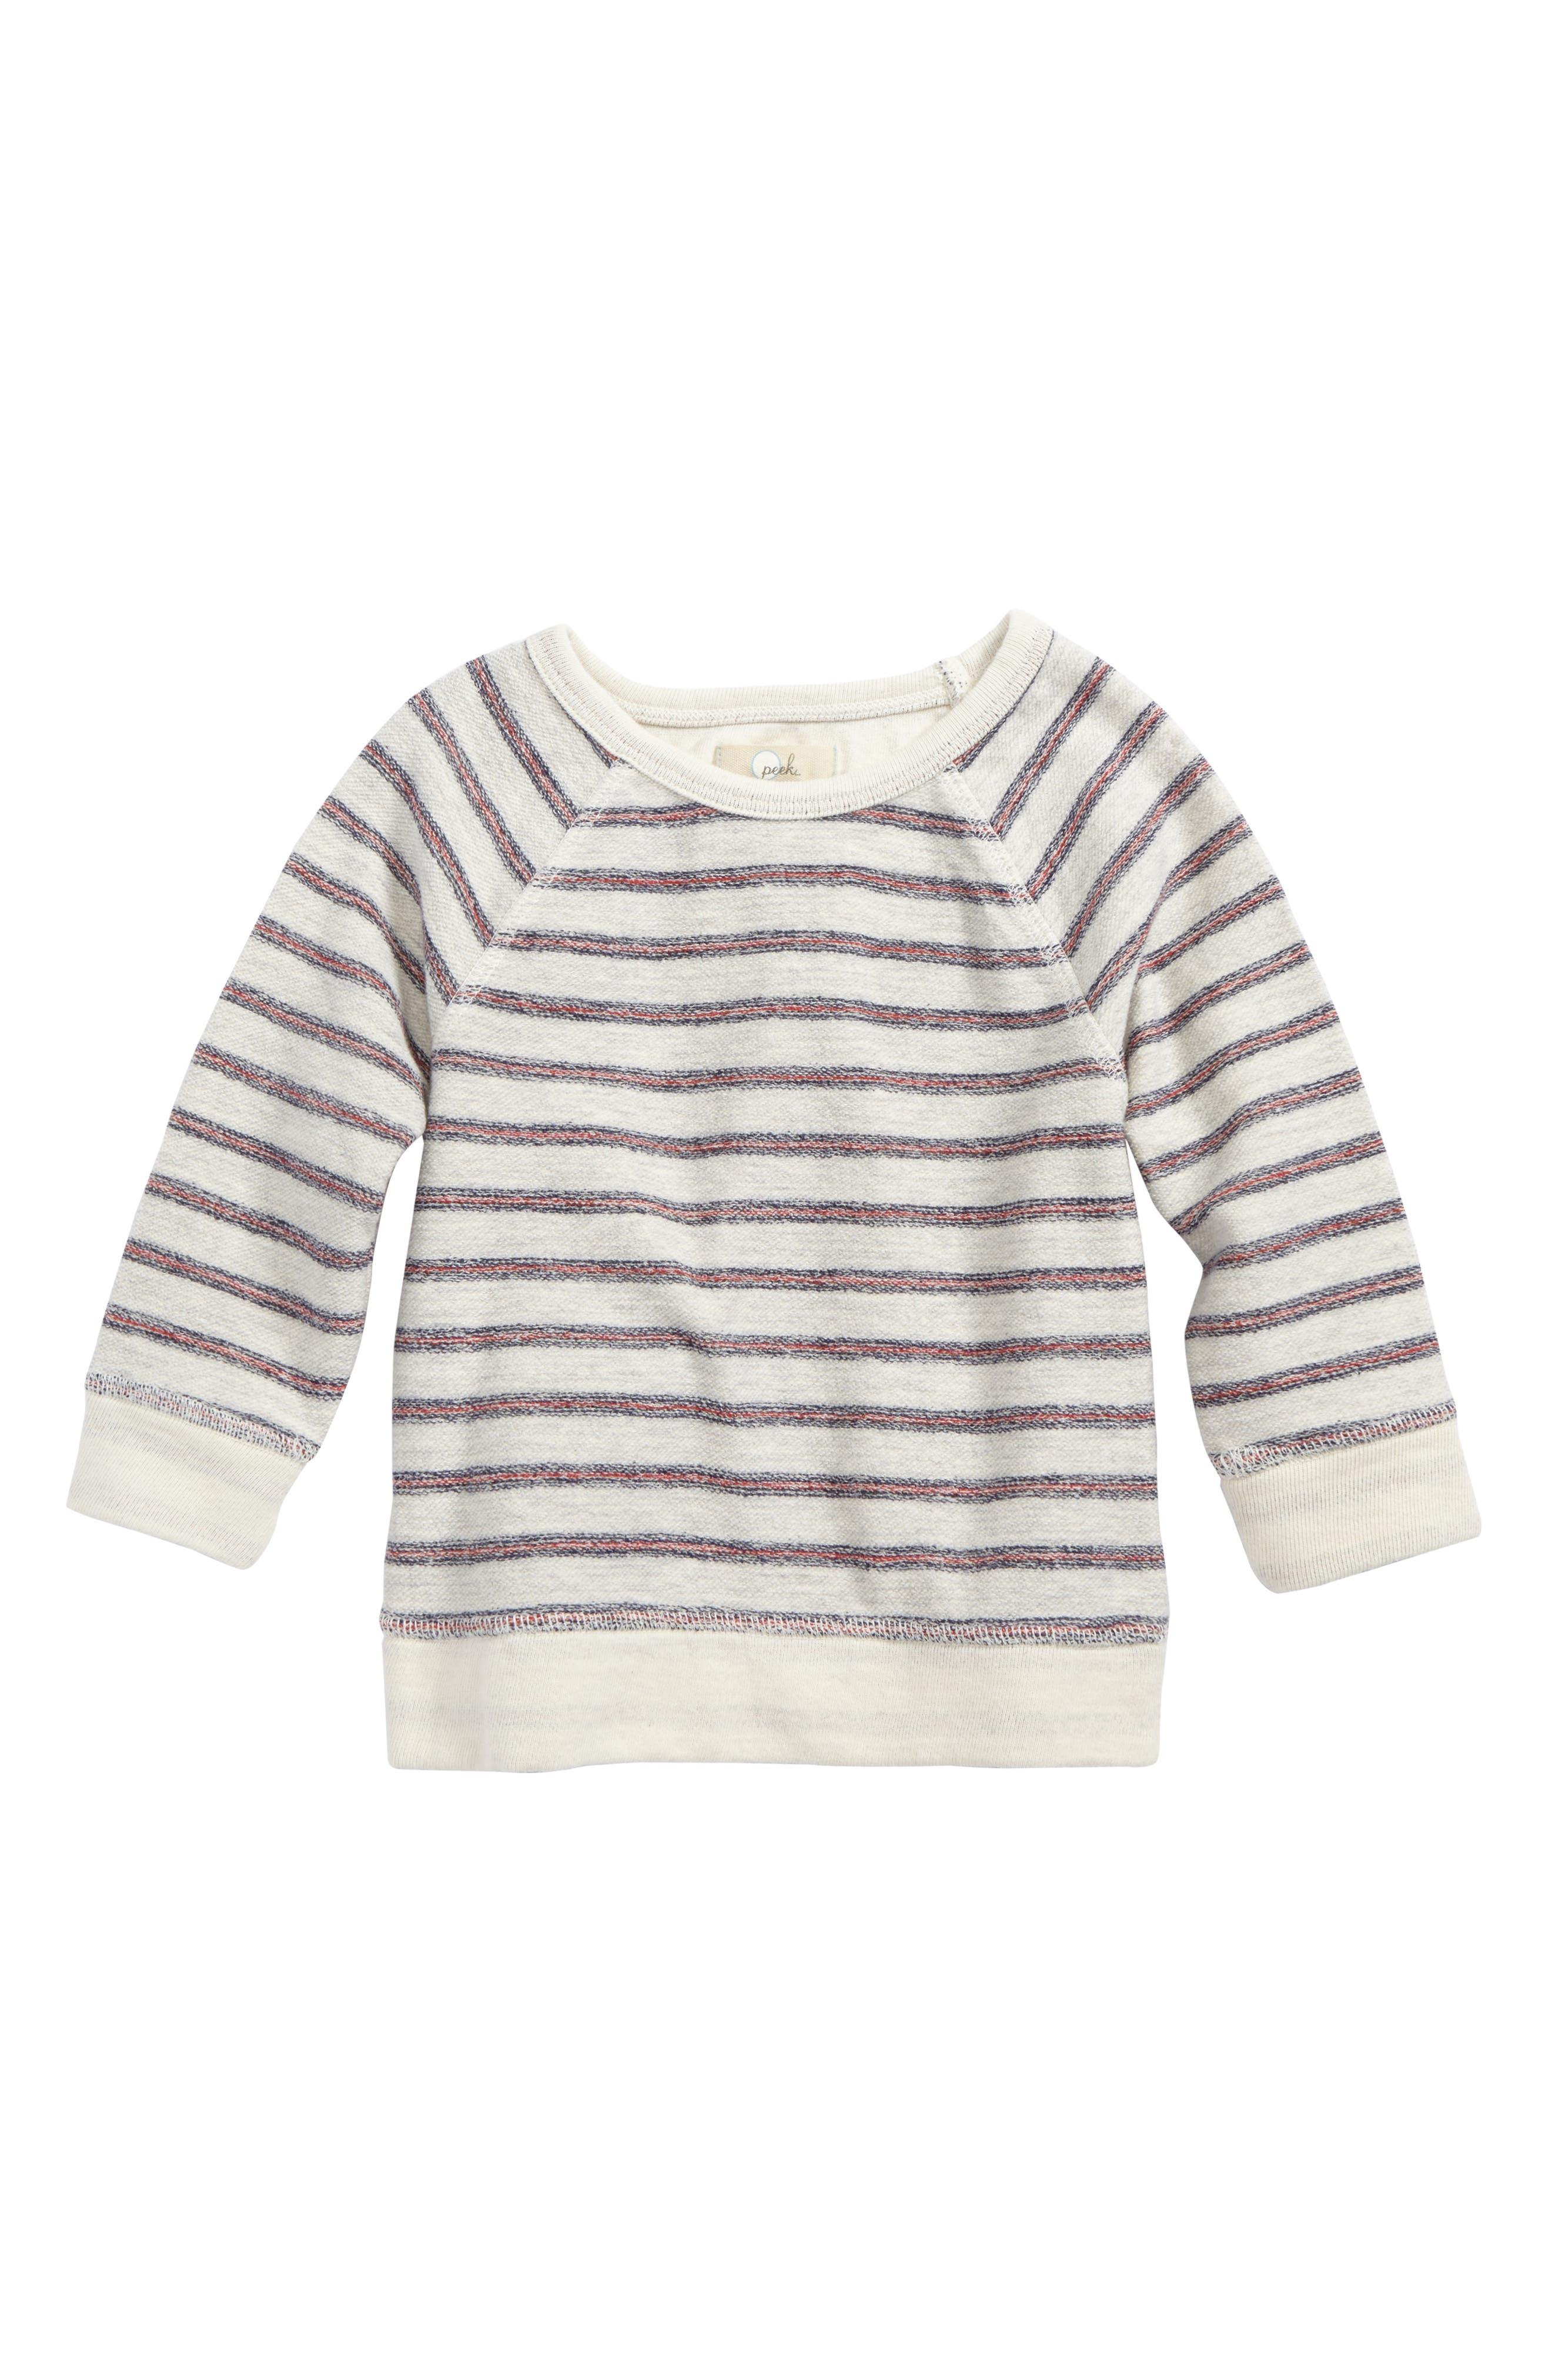 Peek Ziggy Stripe Sweatshirt,                         Main,                         color, Cream